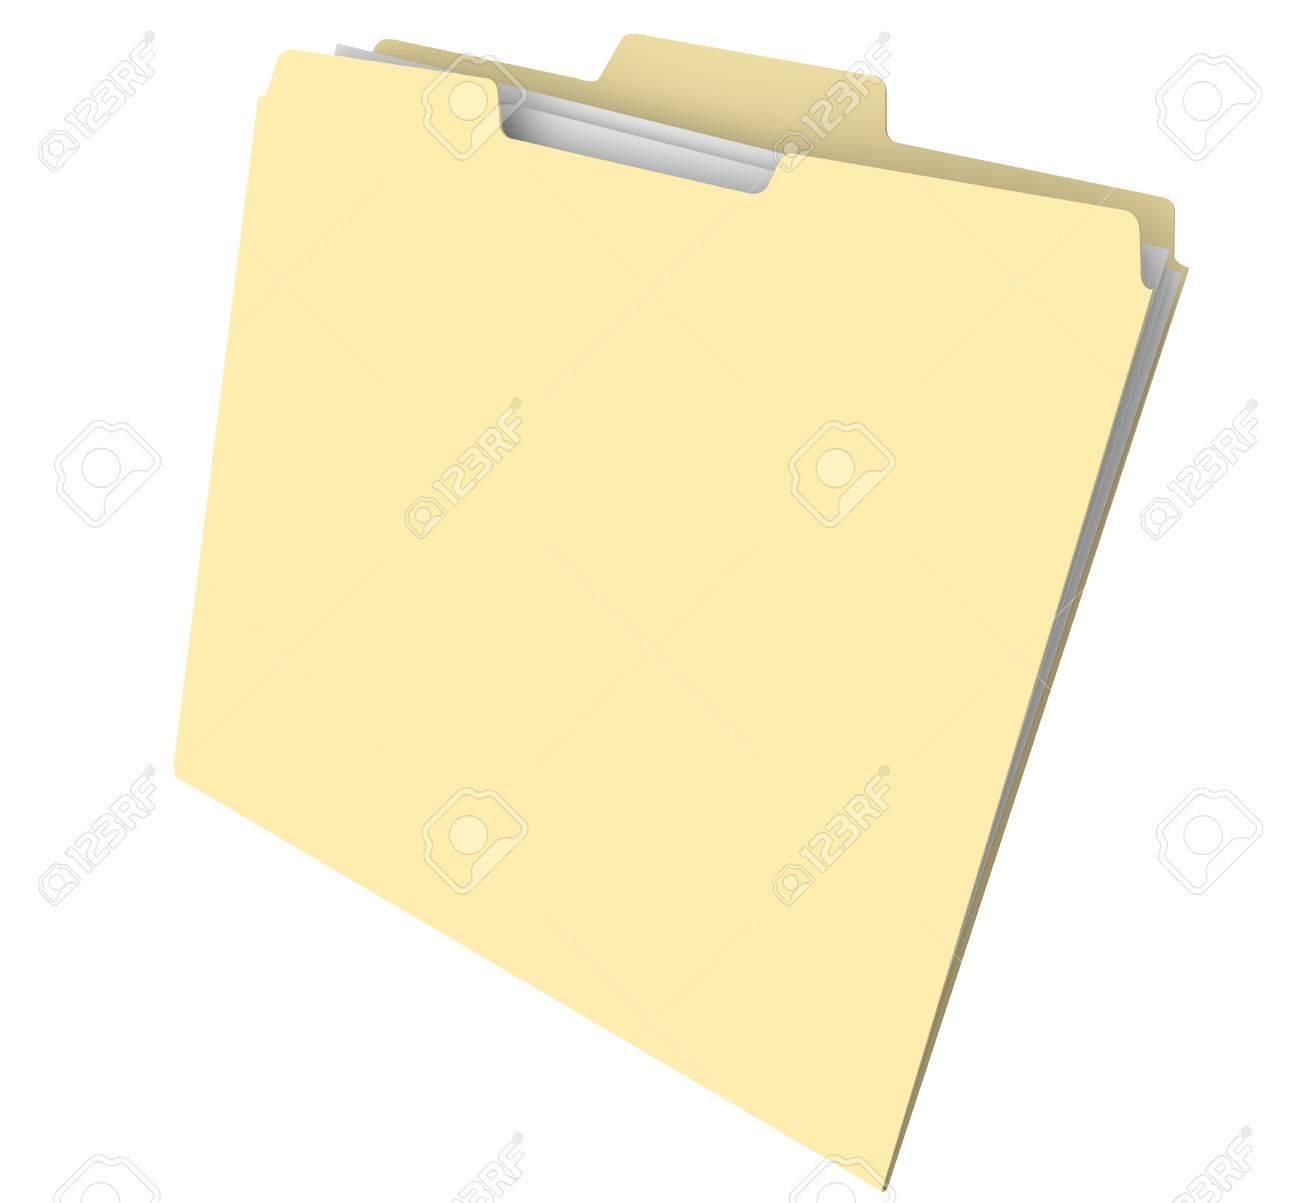 blank documents